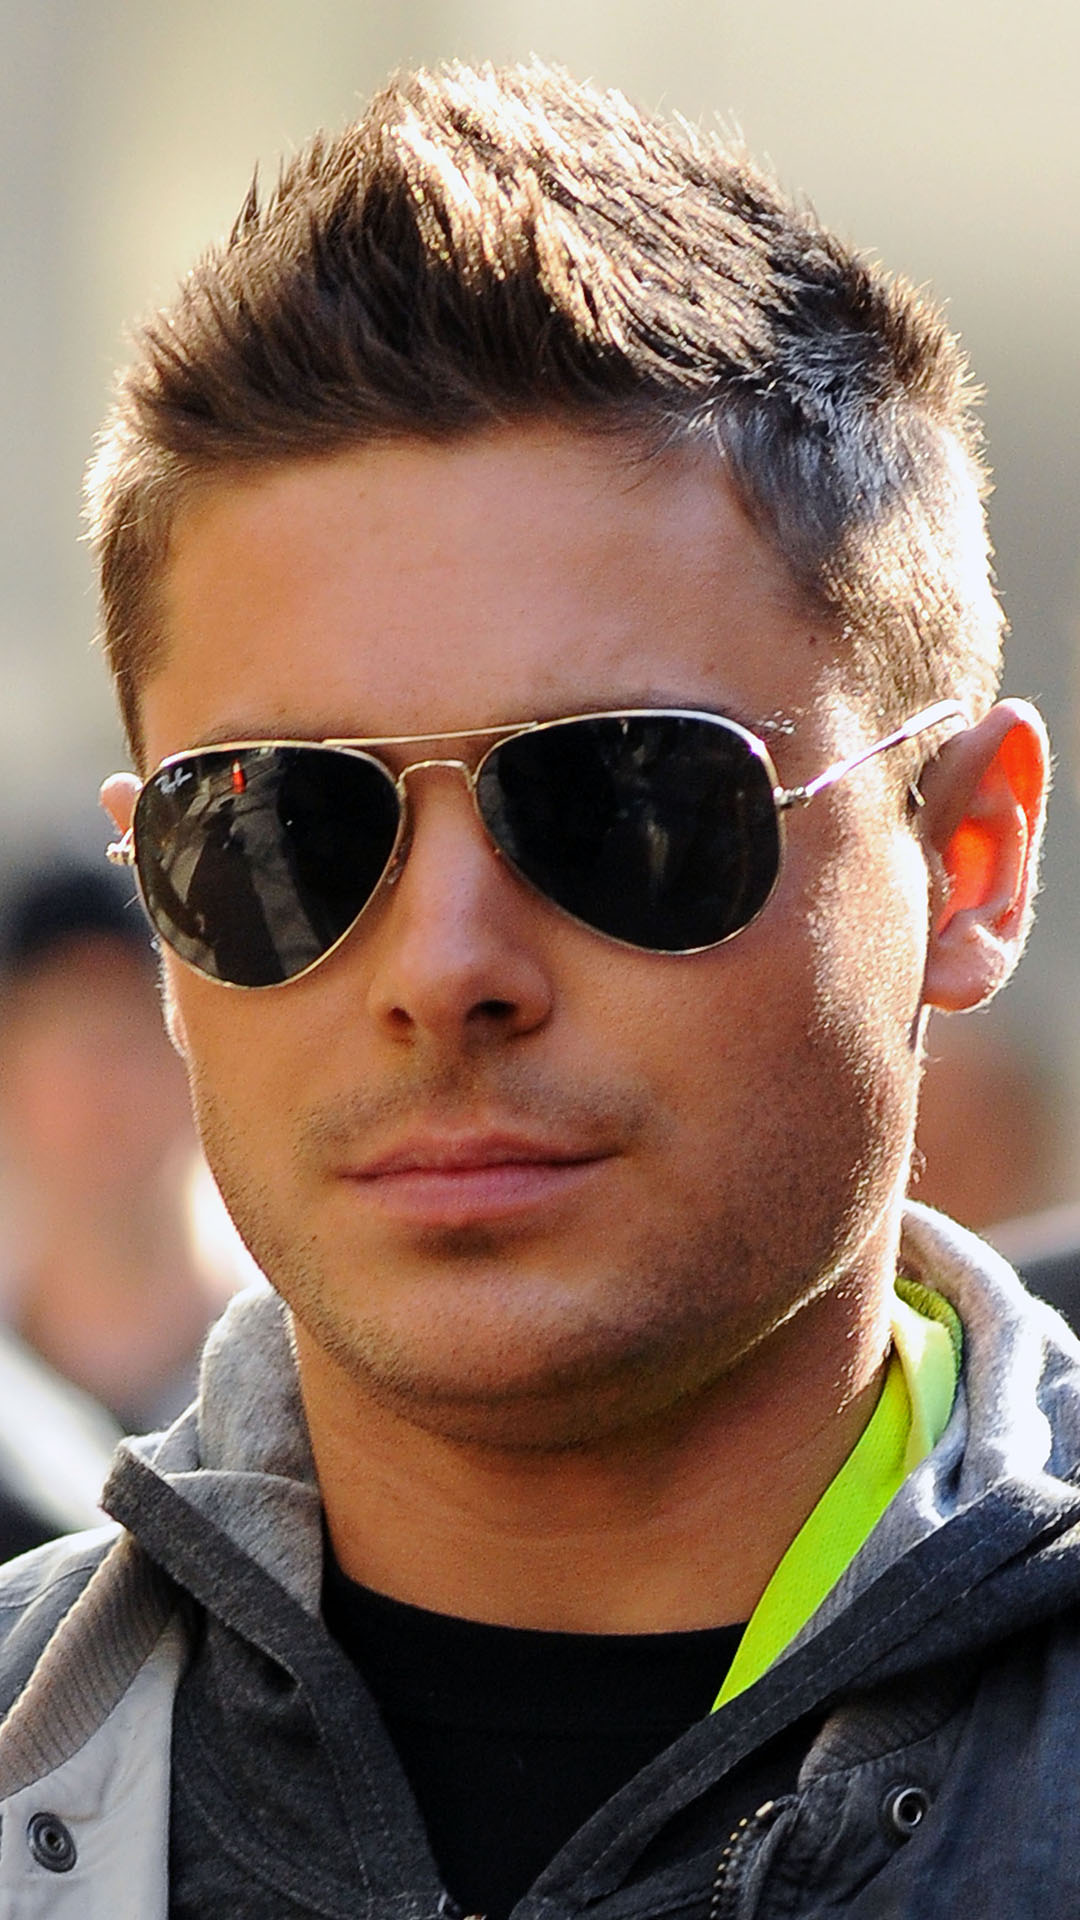 Zac Efron sunglasses